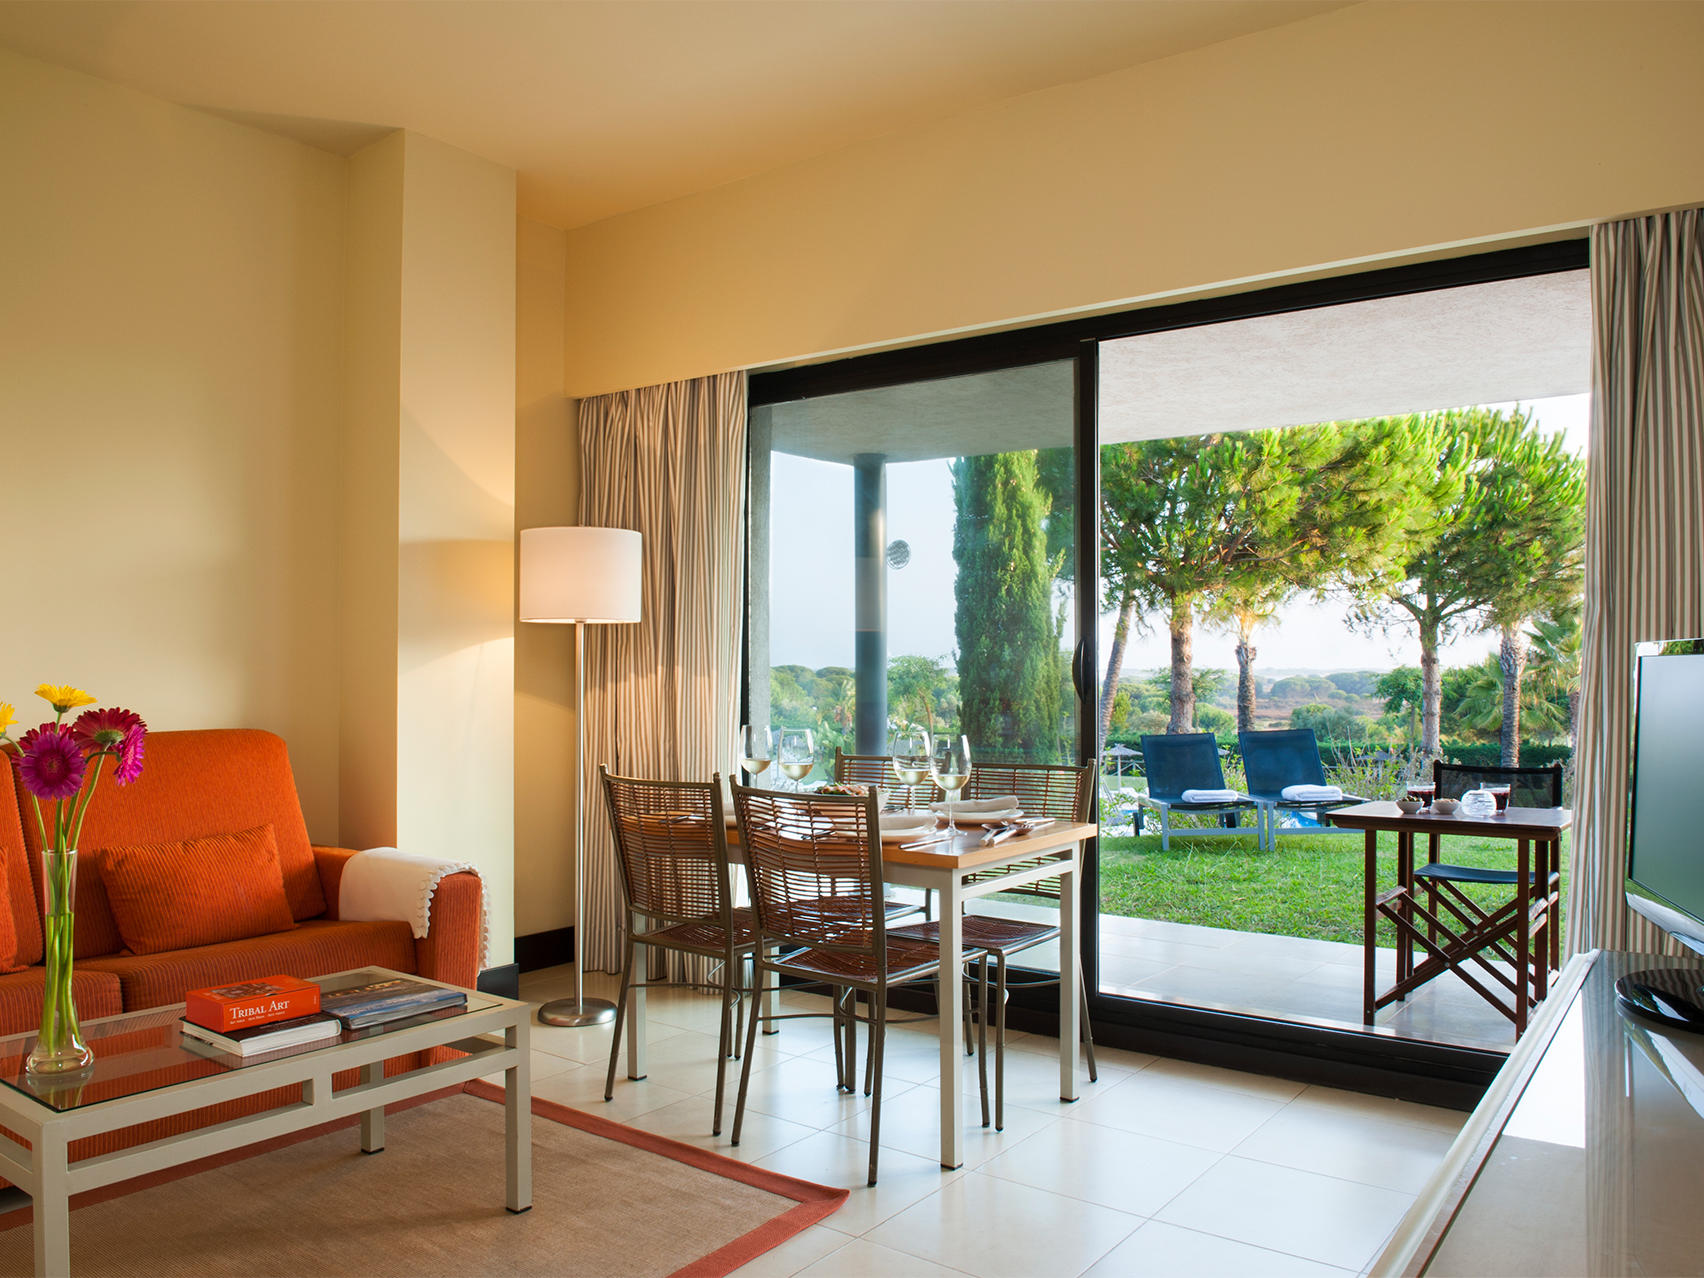 Two bedroom apartment with garden at Precise Resort El Rompido